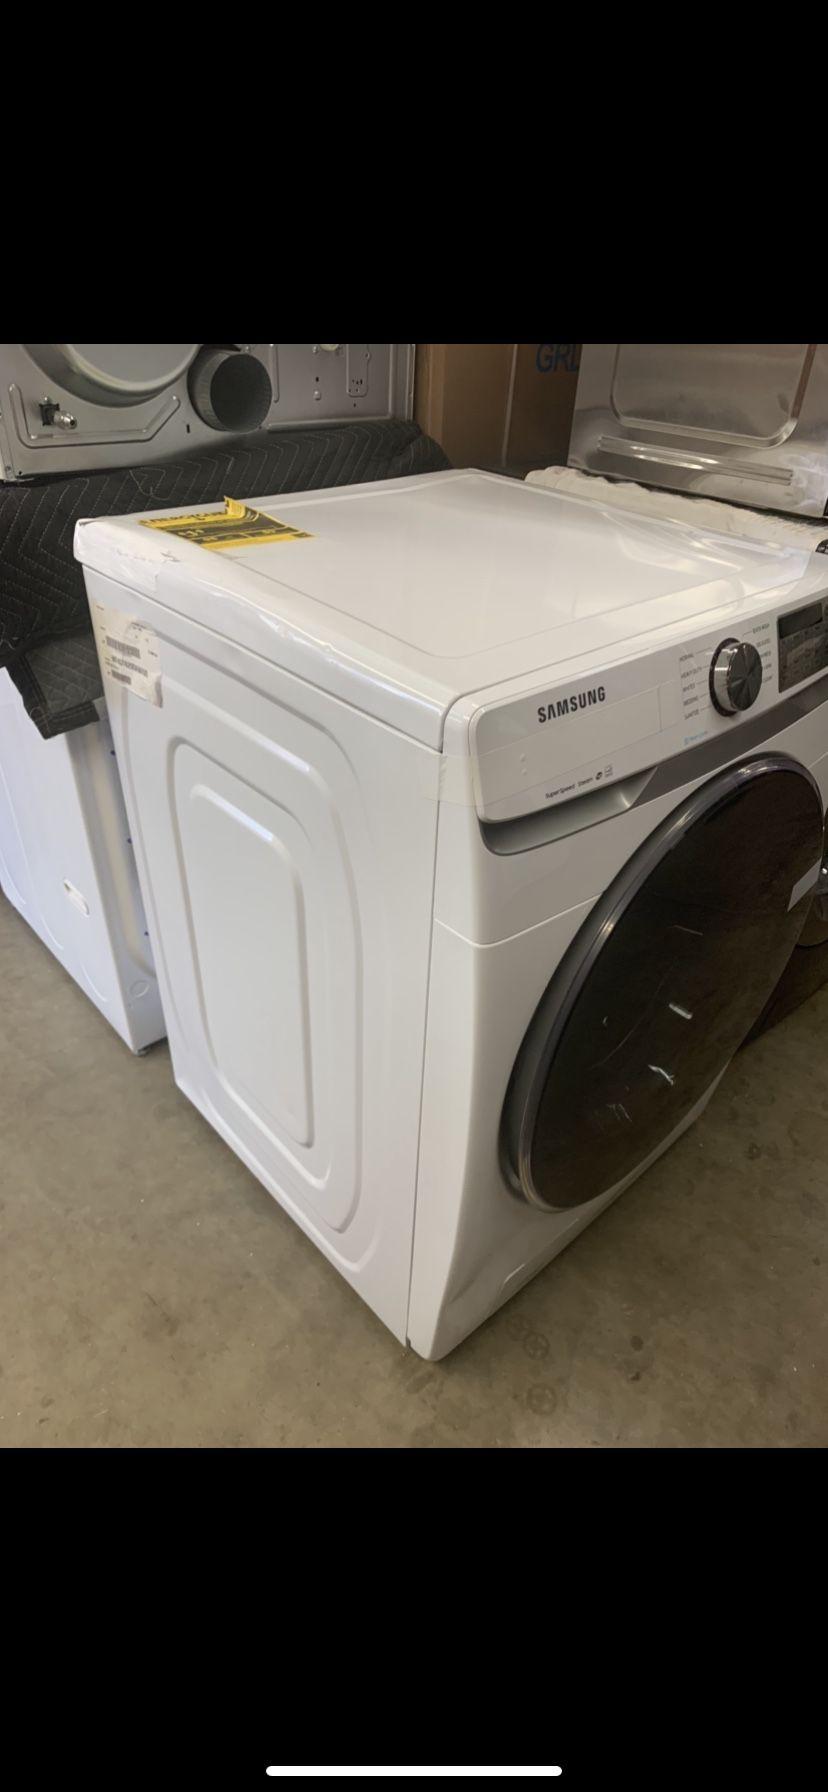 Washer Front Load Steam Samsung 4.5 Cu Ft White